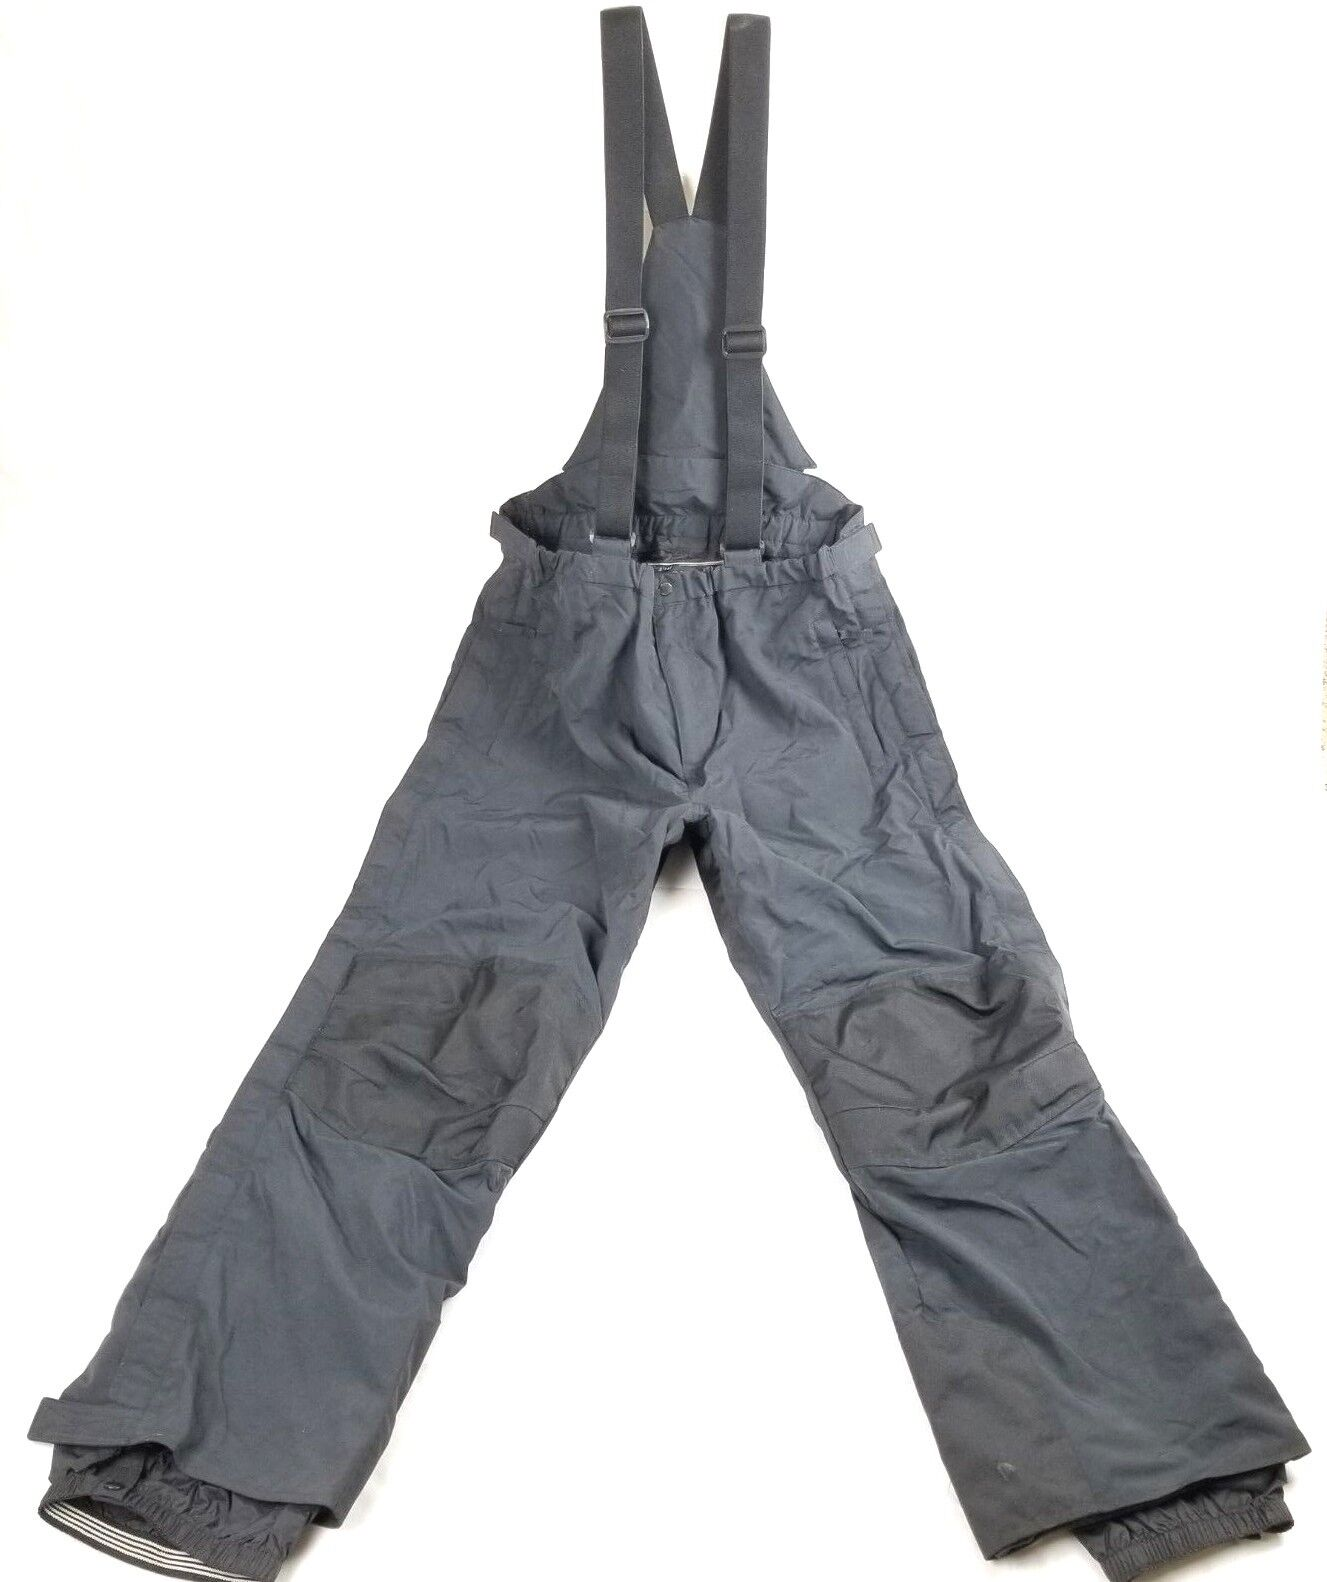 OBERMEYER Men's RADICAL Stormshield Fabric Side Zip Snow Ski Pants Permaloft XL